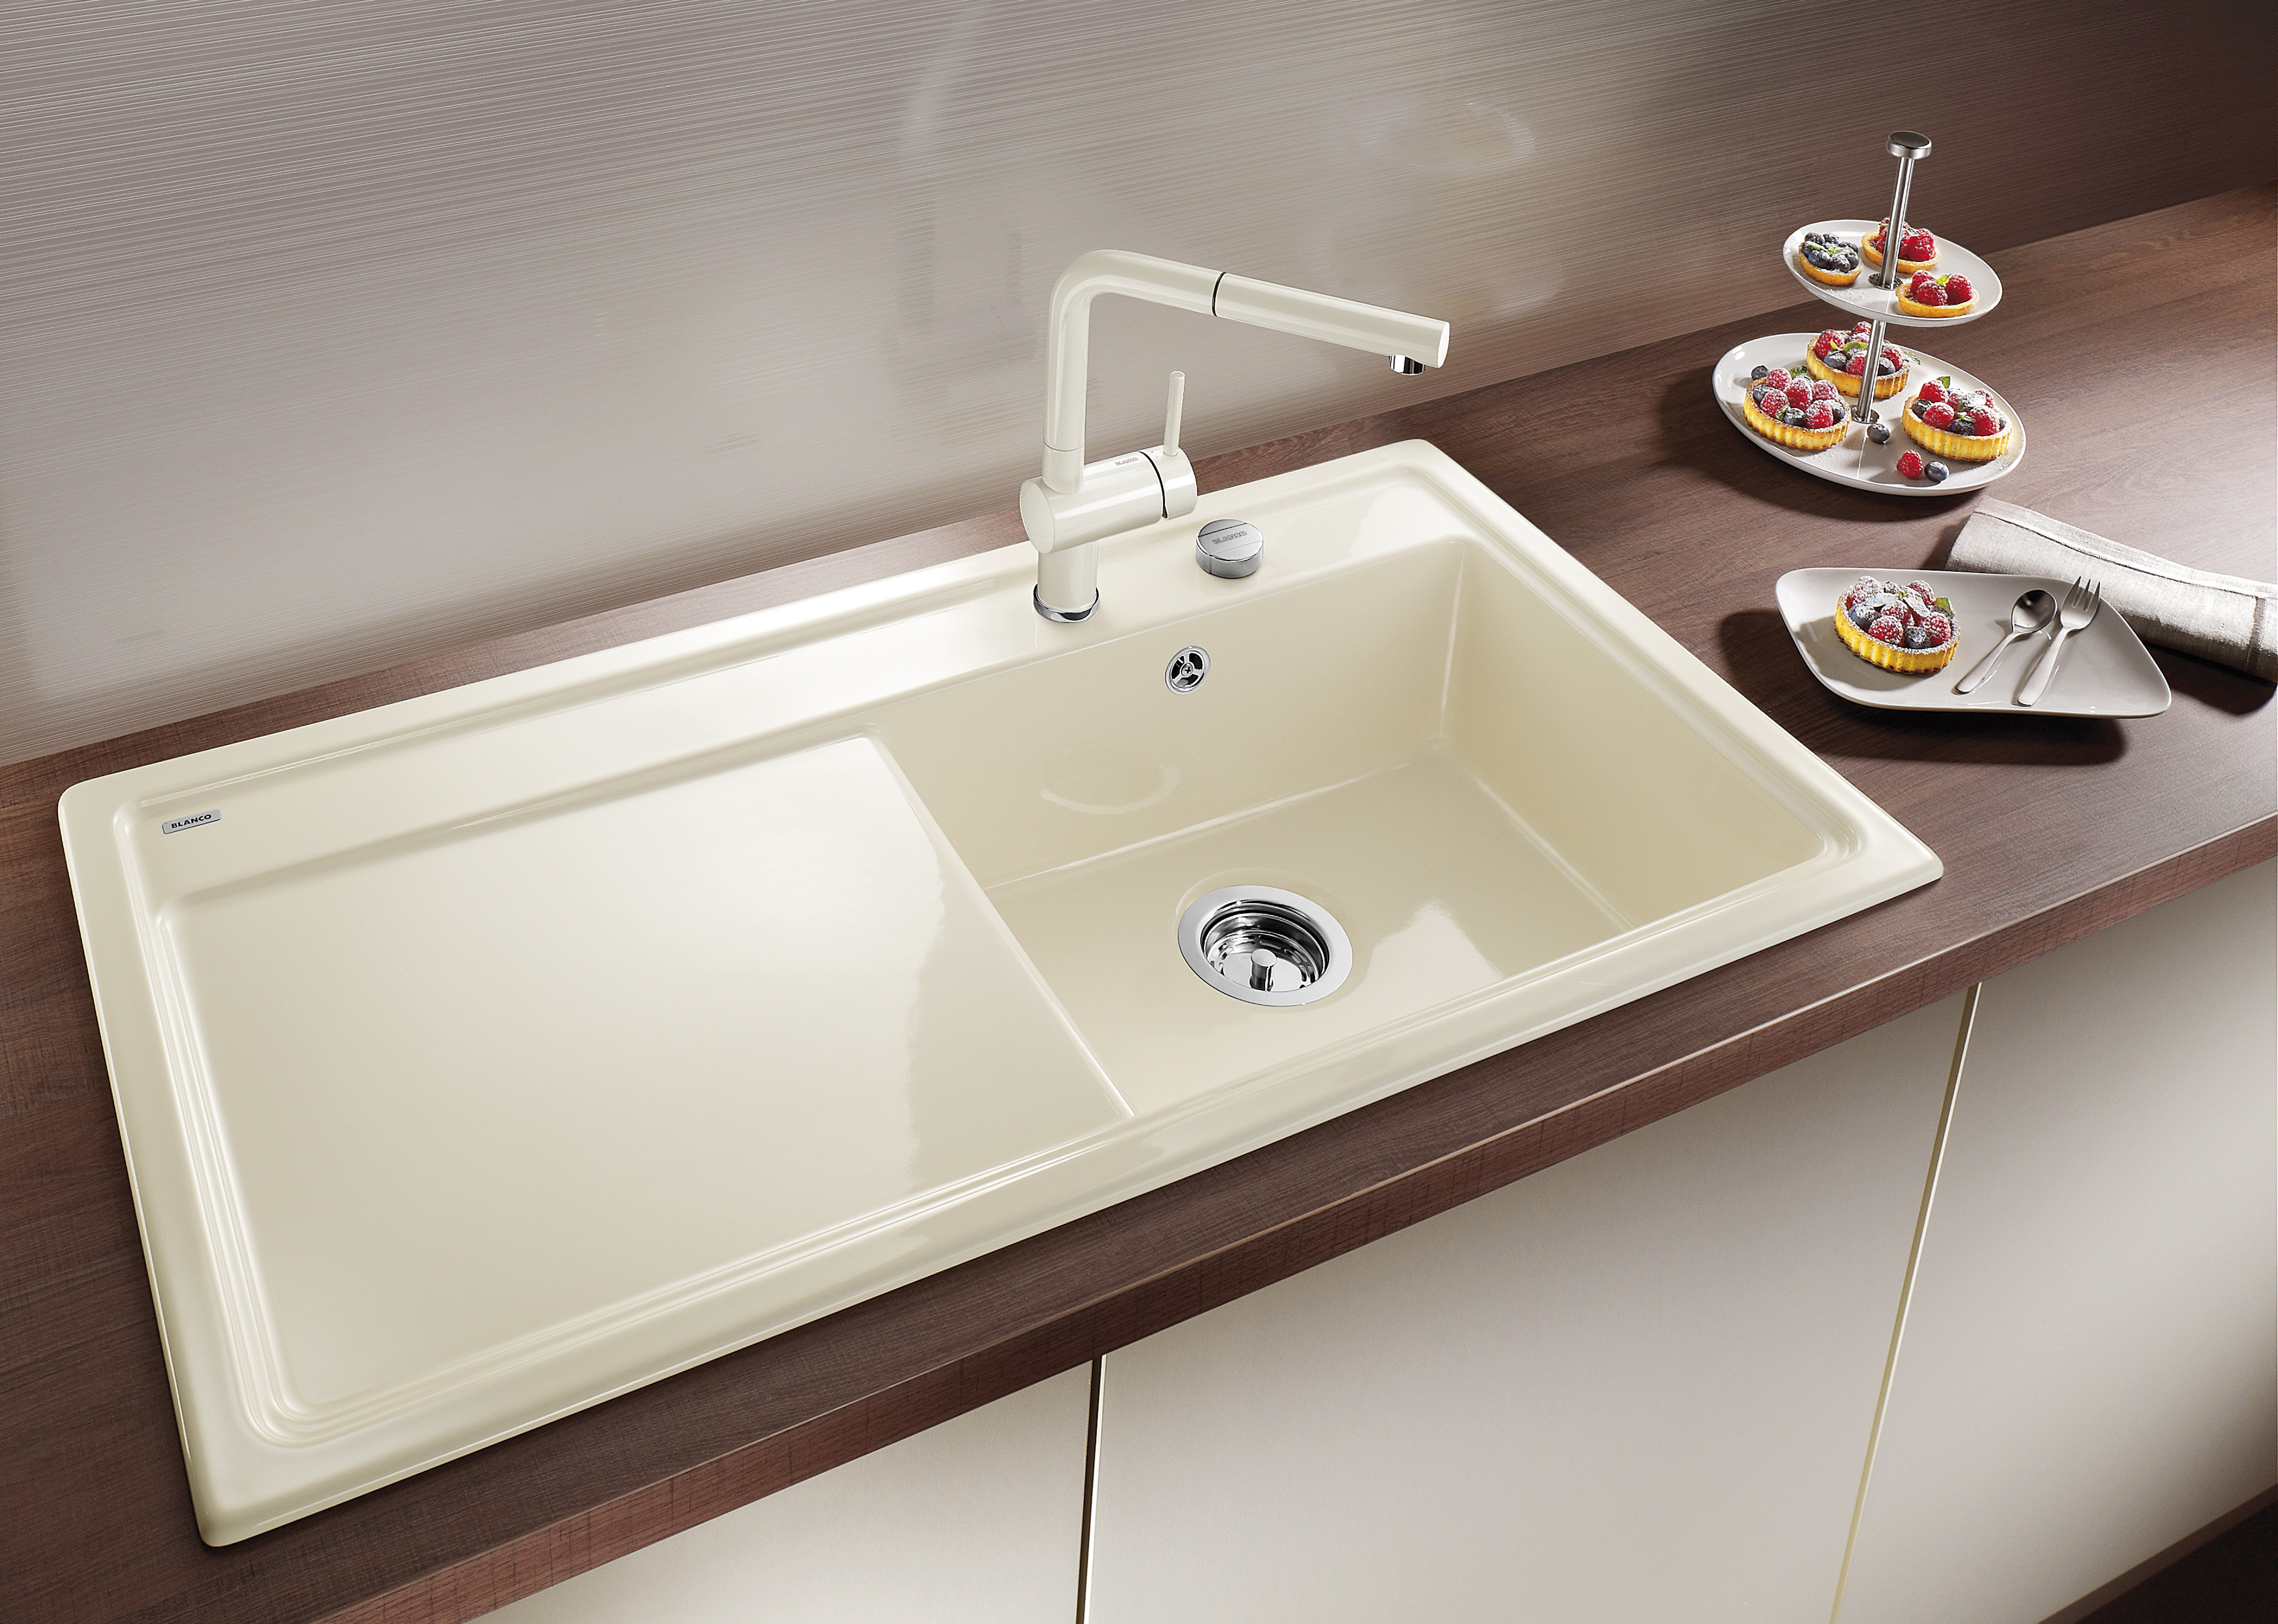 Mein Ausstellungsstück: NEU BLANCO Spüle Keramik-Spüle Zenar XL 6S